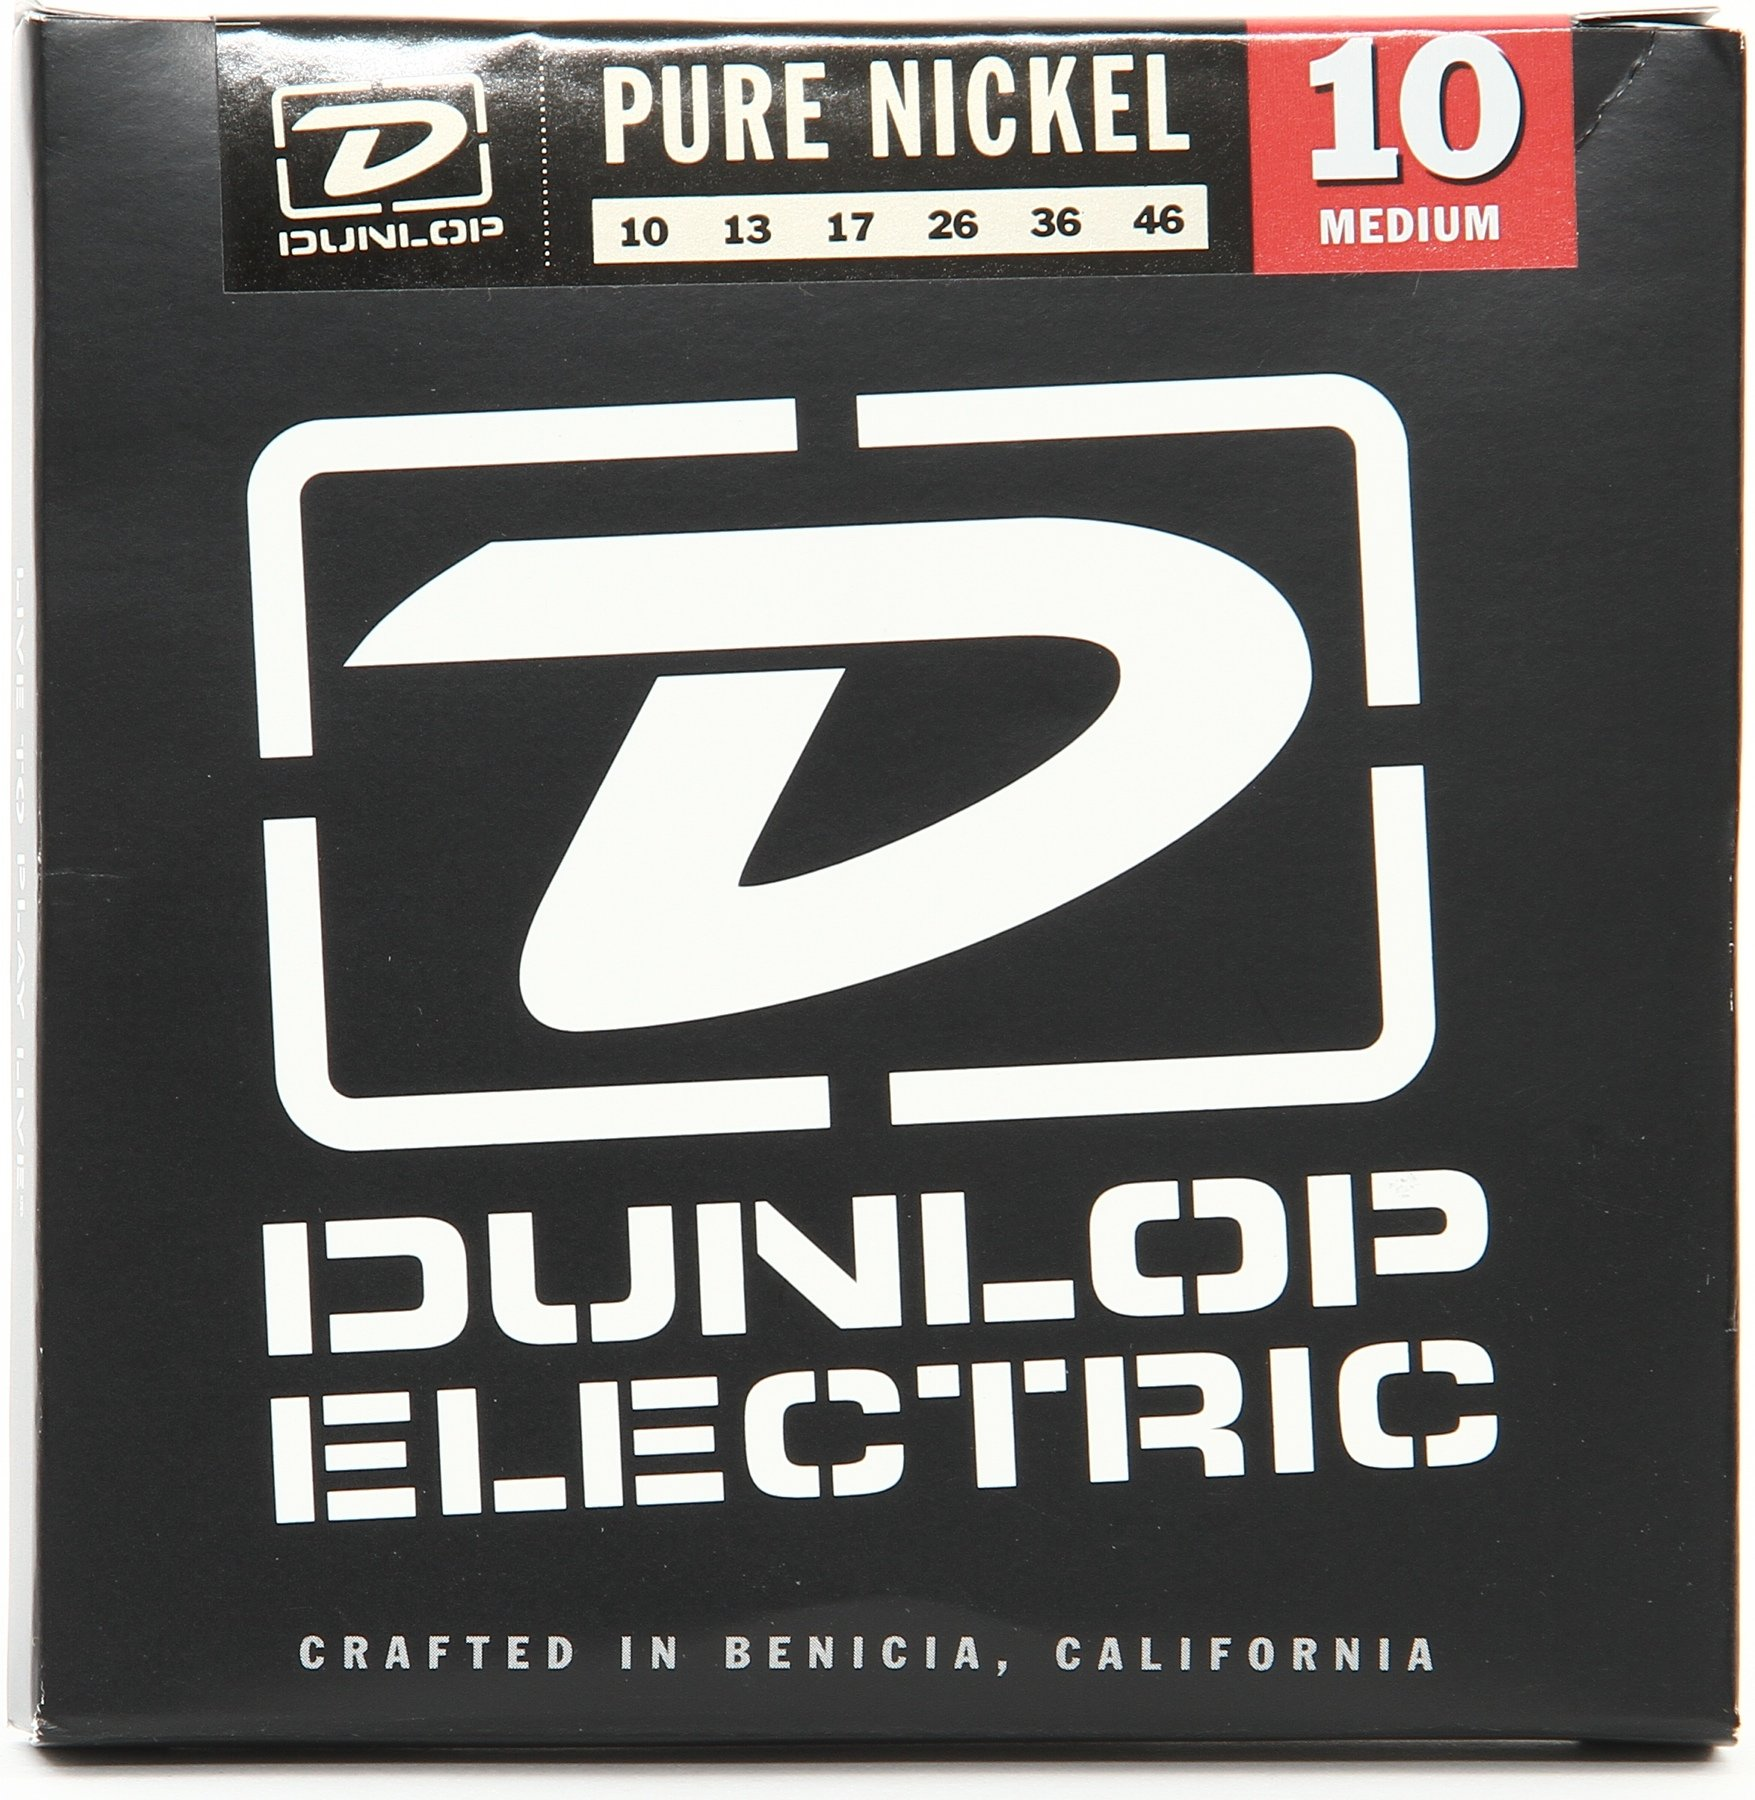 Cheap Jim Dunlop DEK30 30 Gauge Pure Nickel Electric Guitar D String Light/Heavy (Single) Black Friday & Cyber Monday 2019